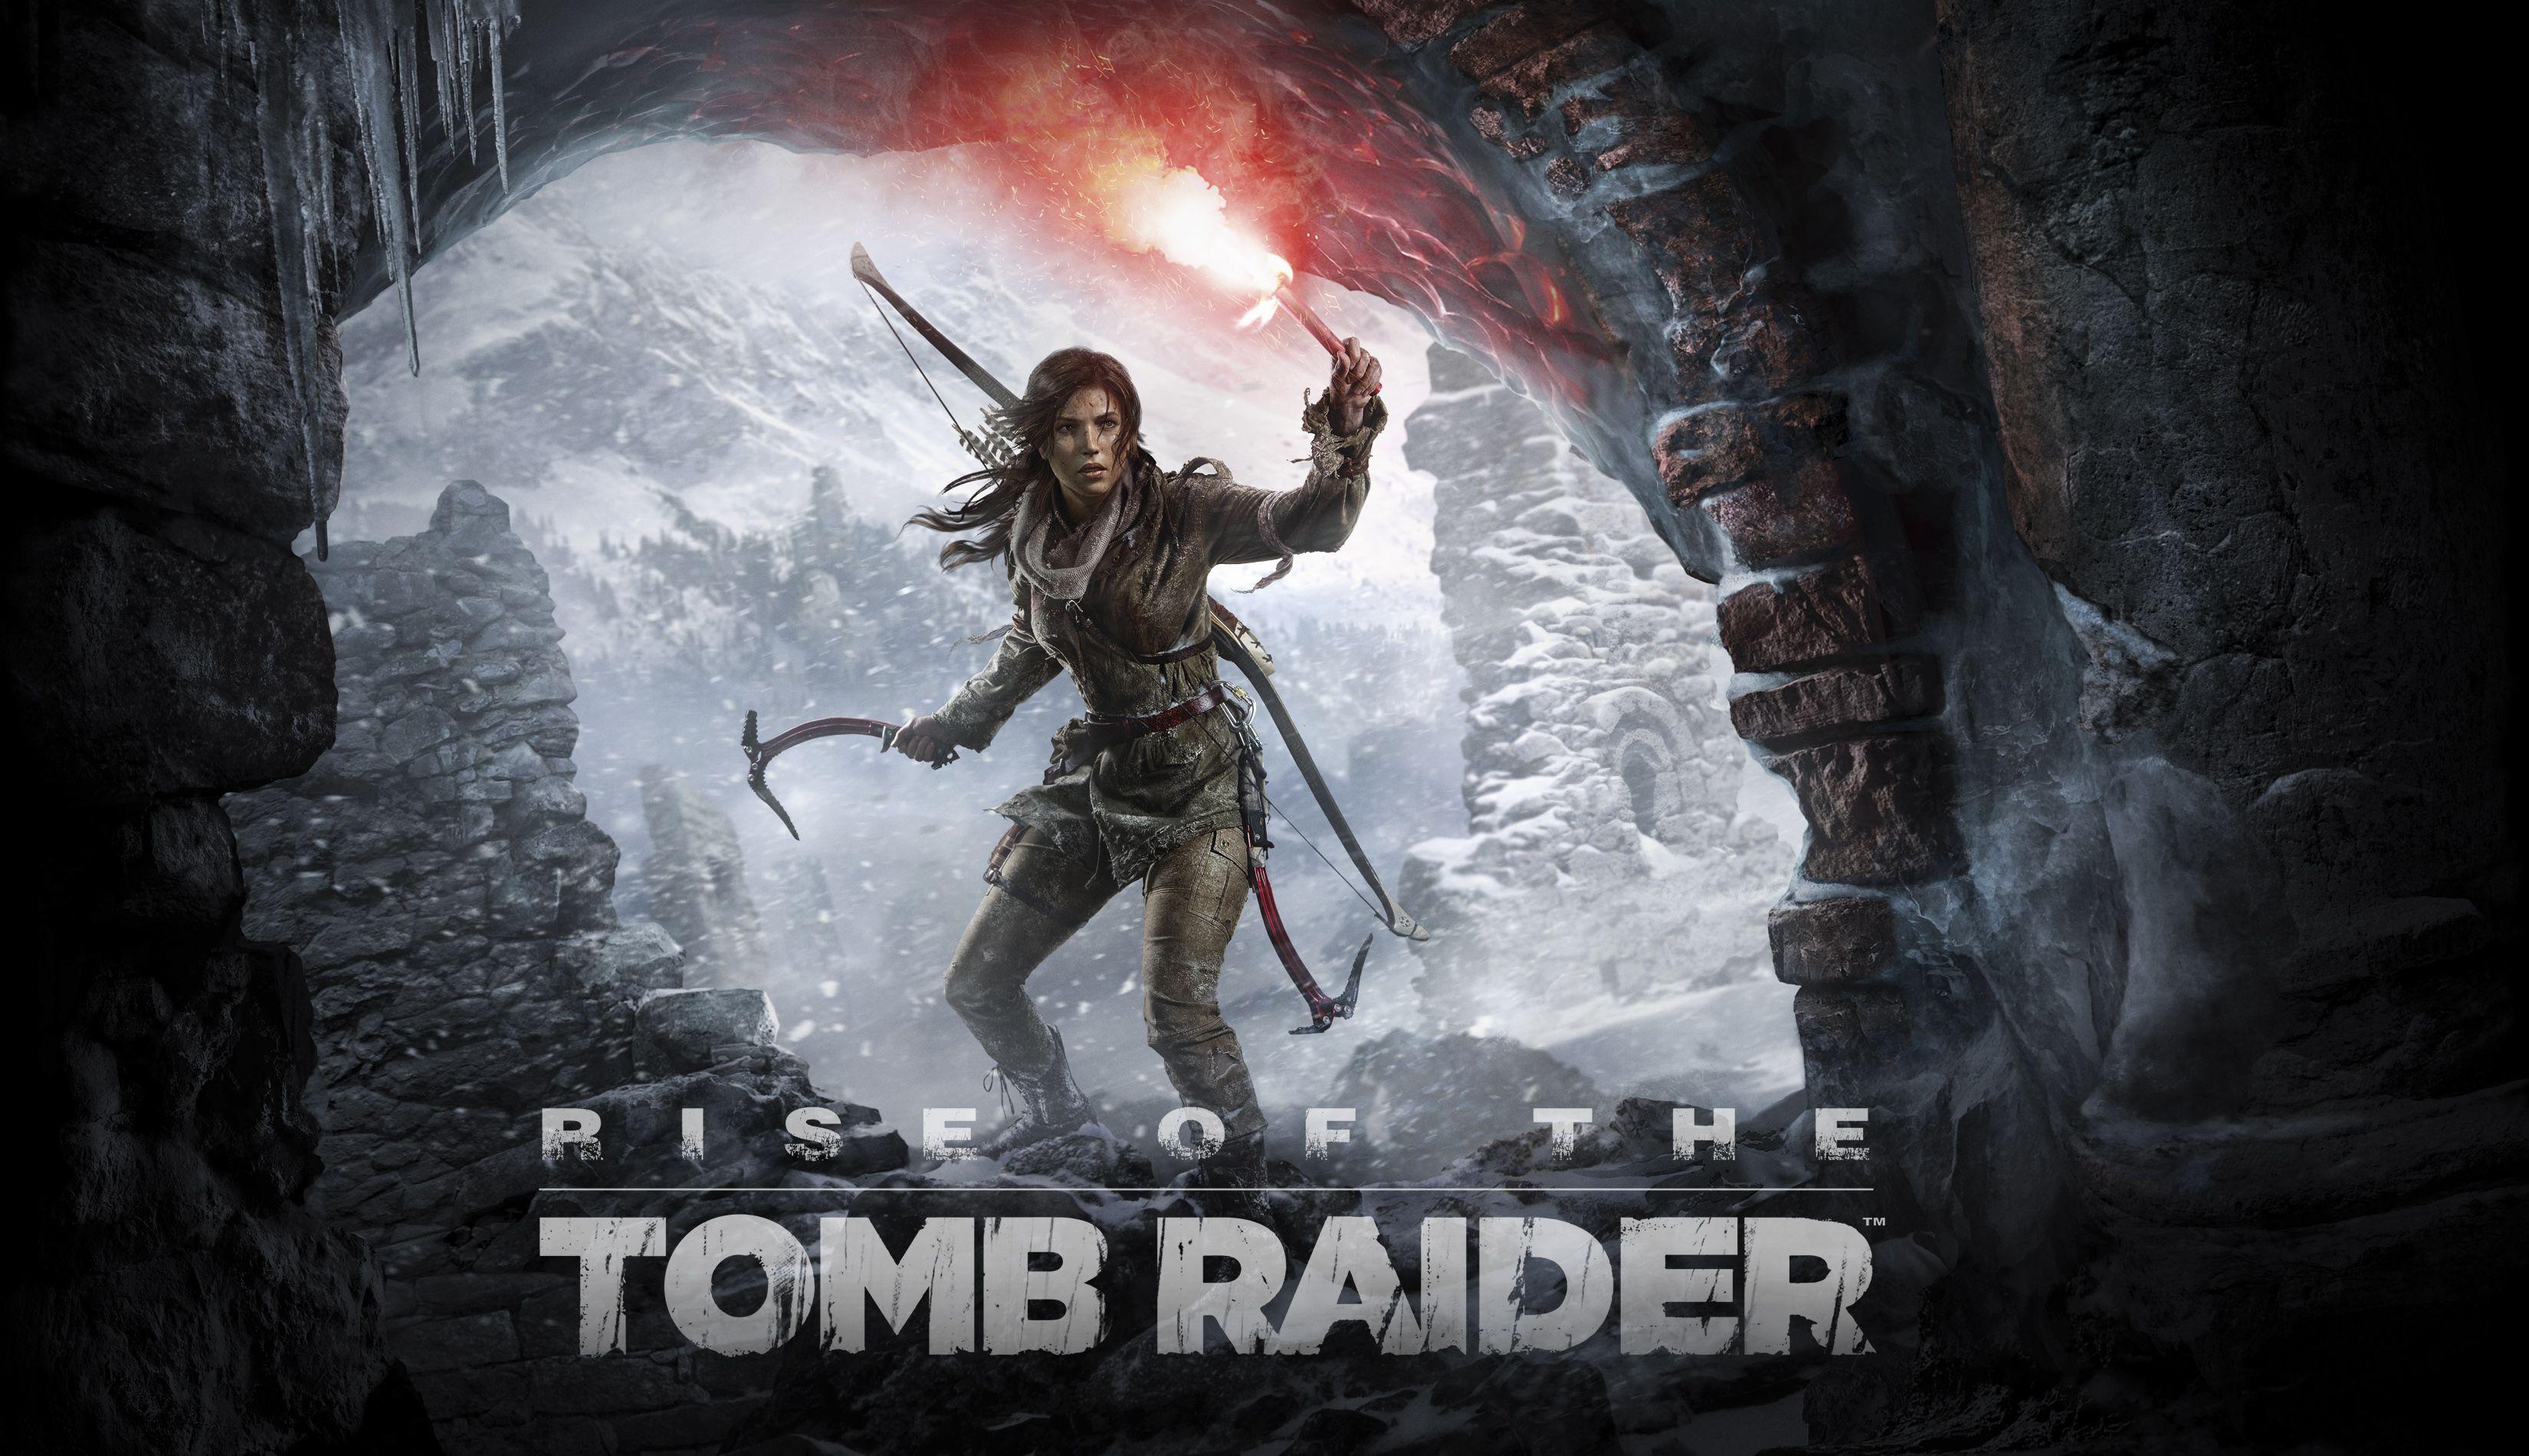 Rise of the Tomb Raider su PC: requisiti sistema e analisi performance